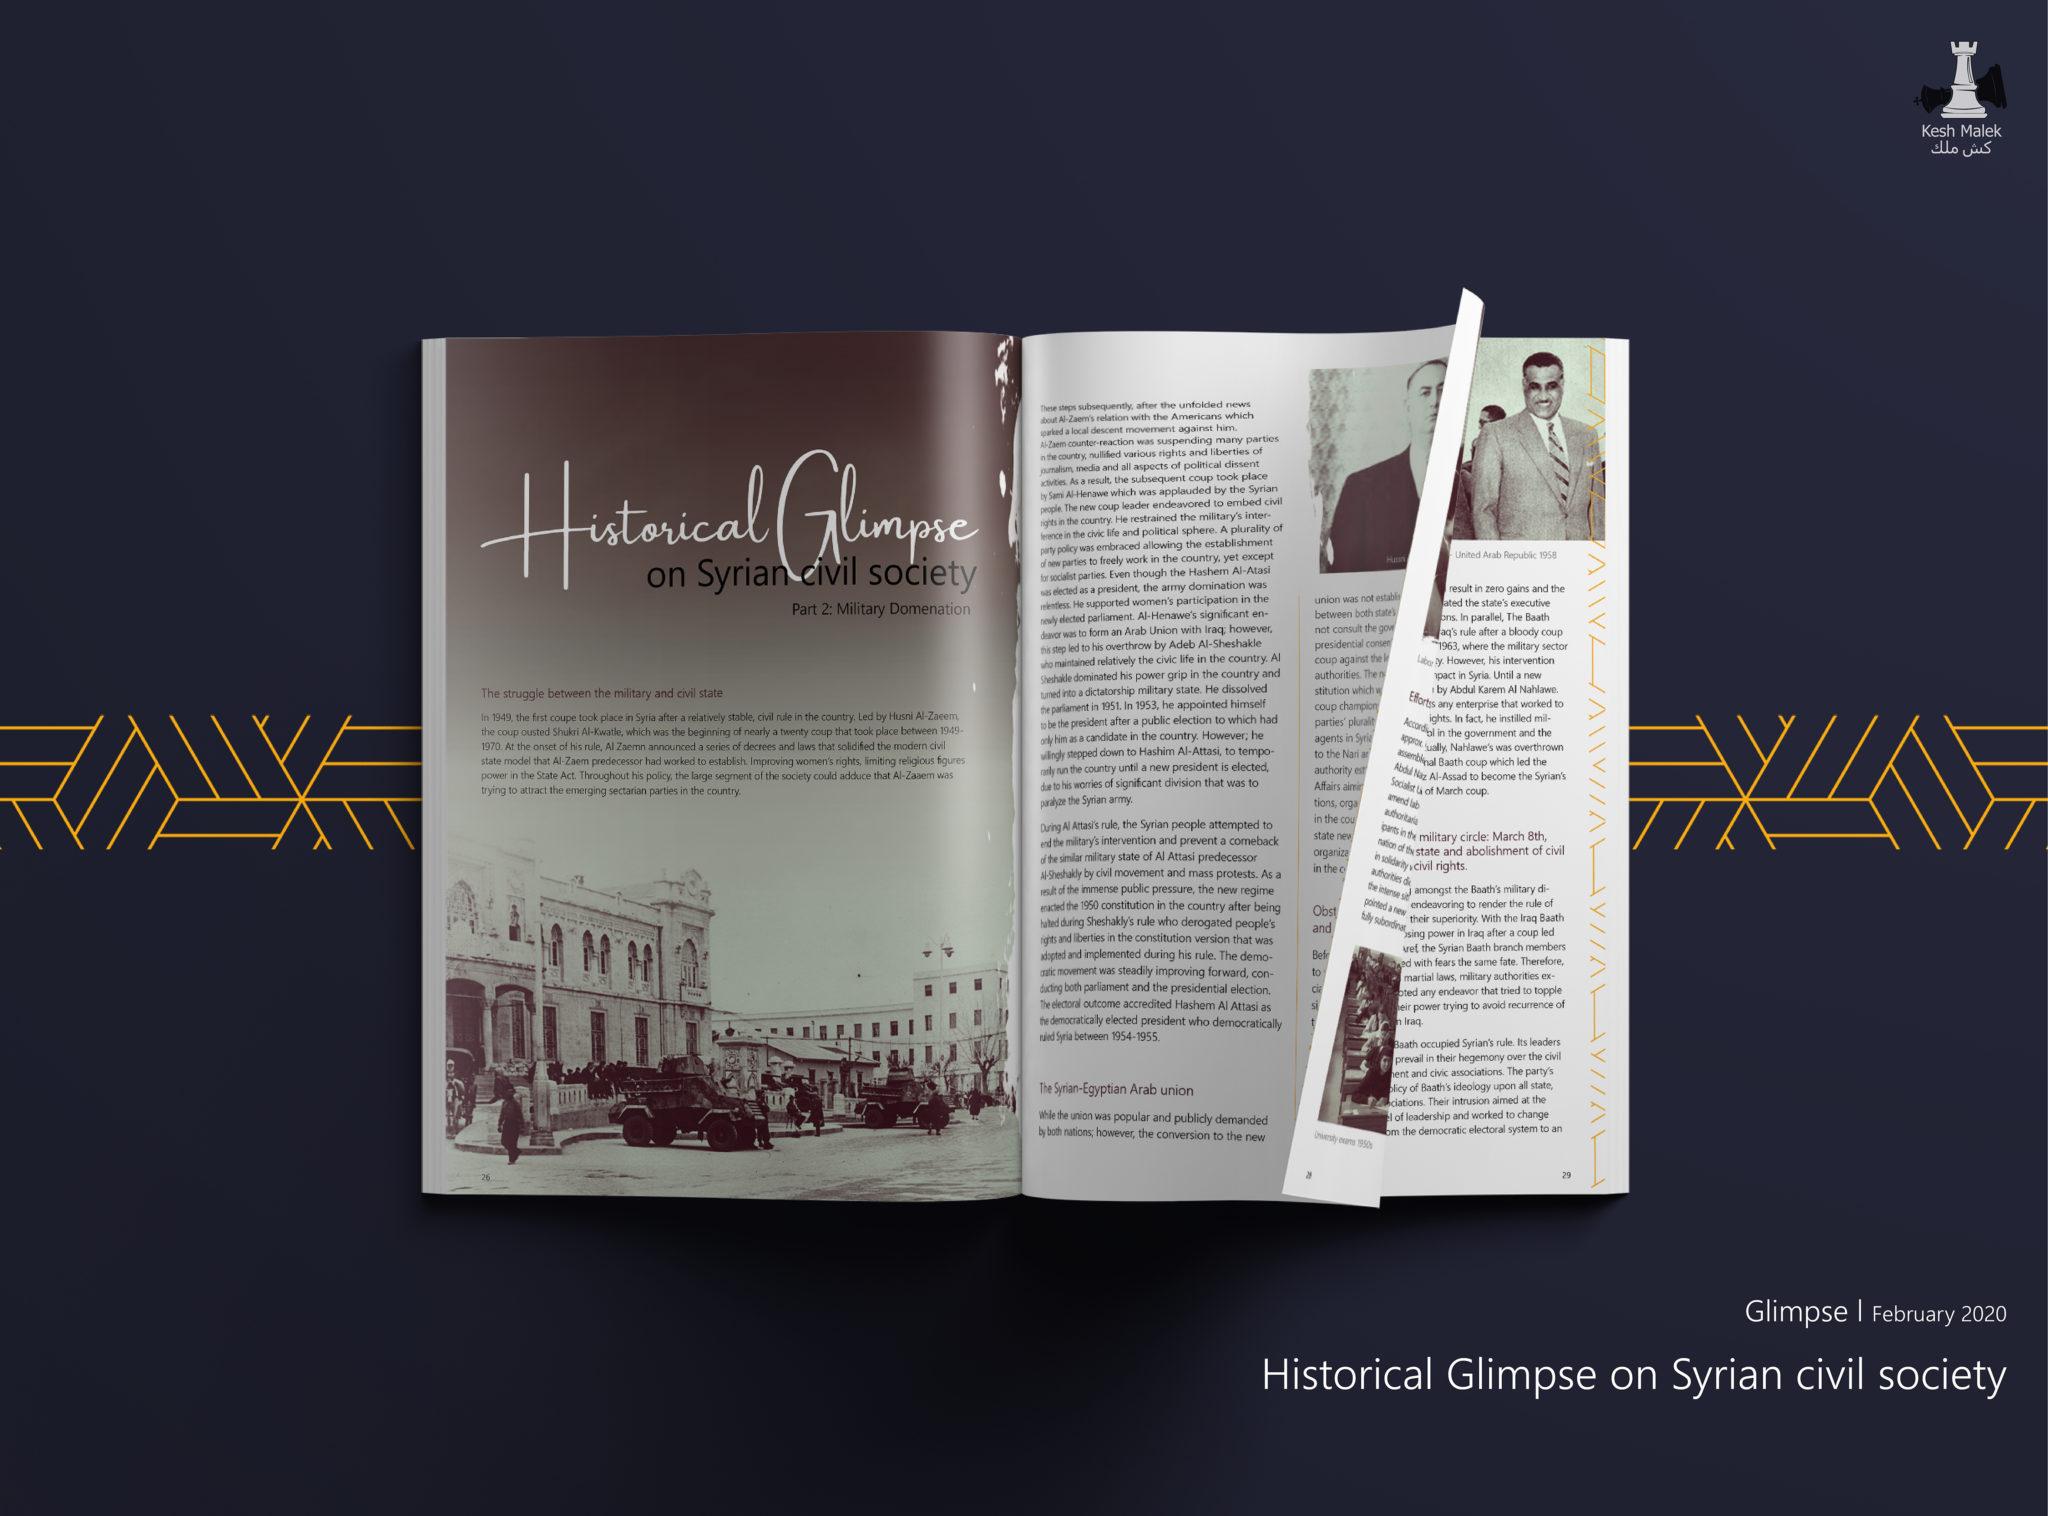 Historical glimpse on Syrian civil society pt 2